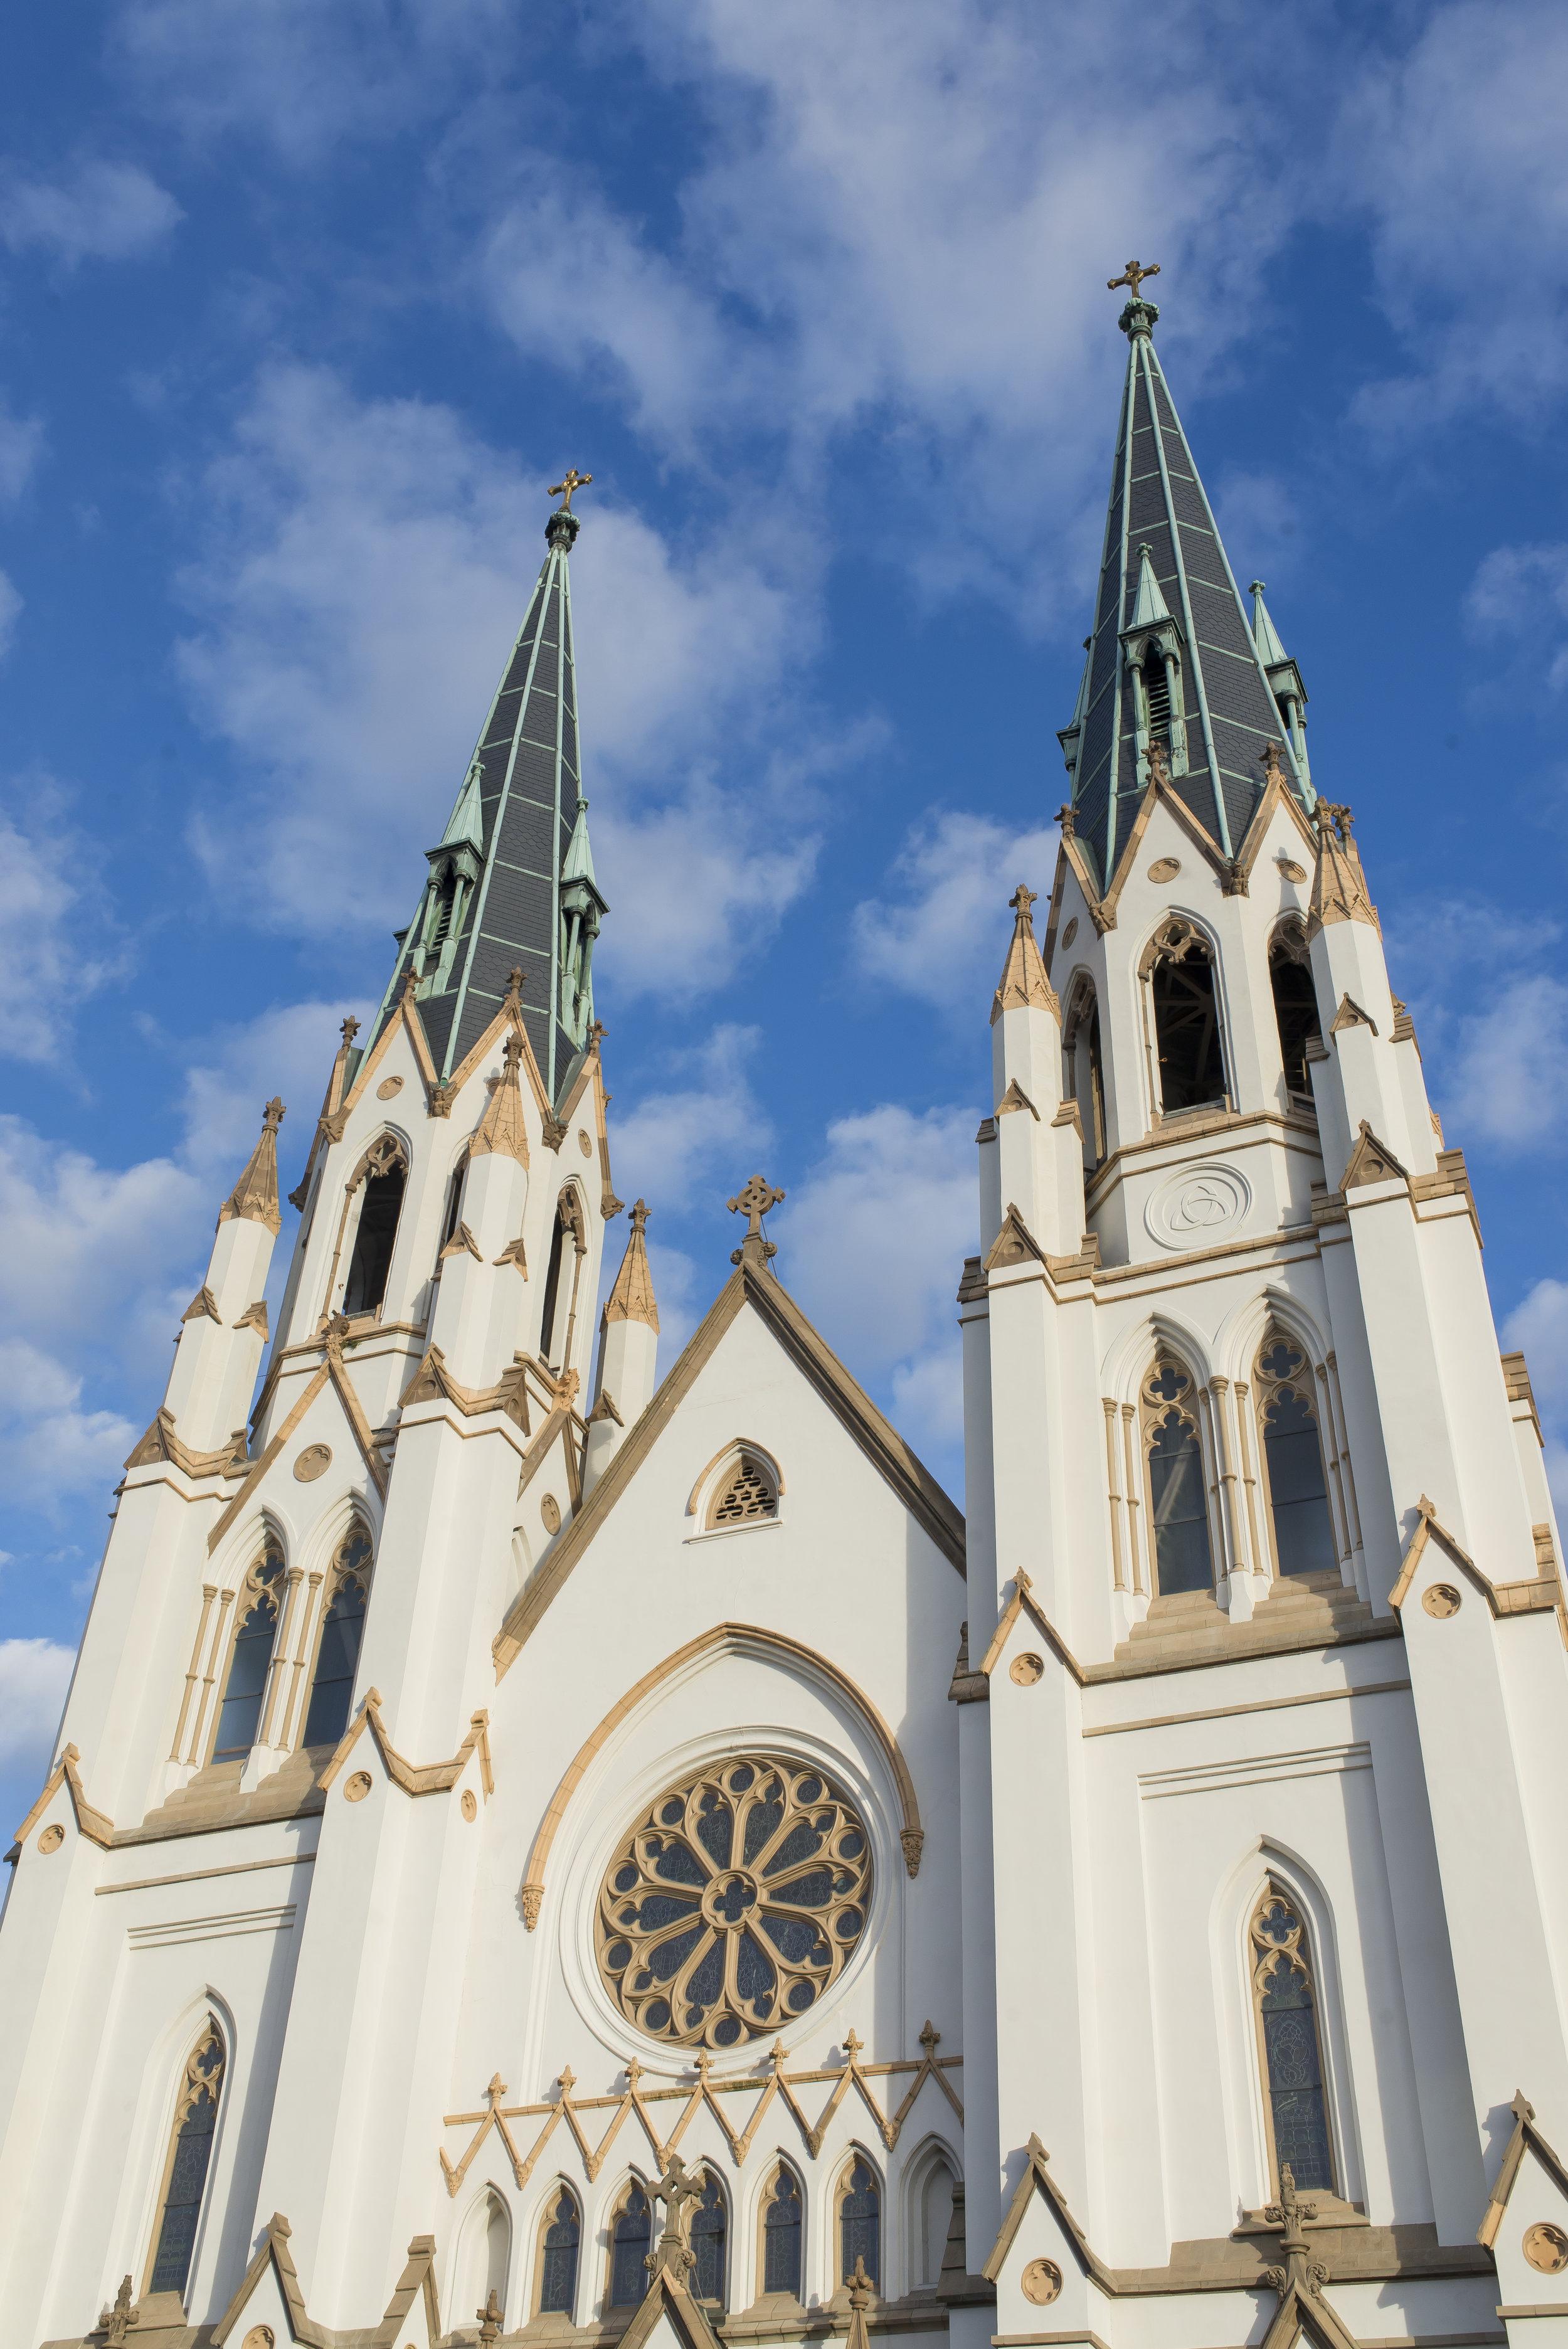 The Cathedral of St. John the Baptist, Savannah GA | Genteel & Bard